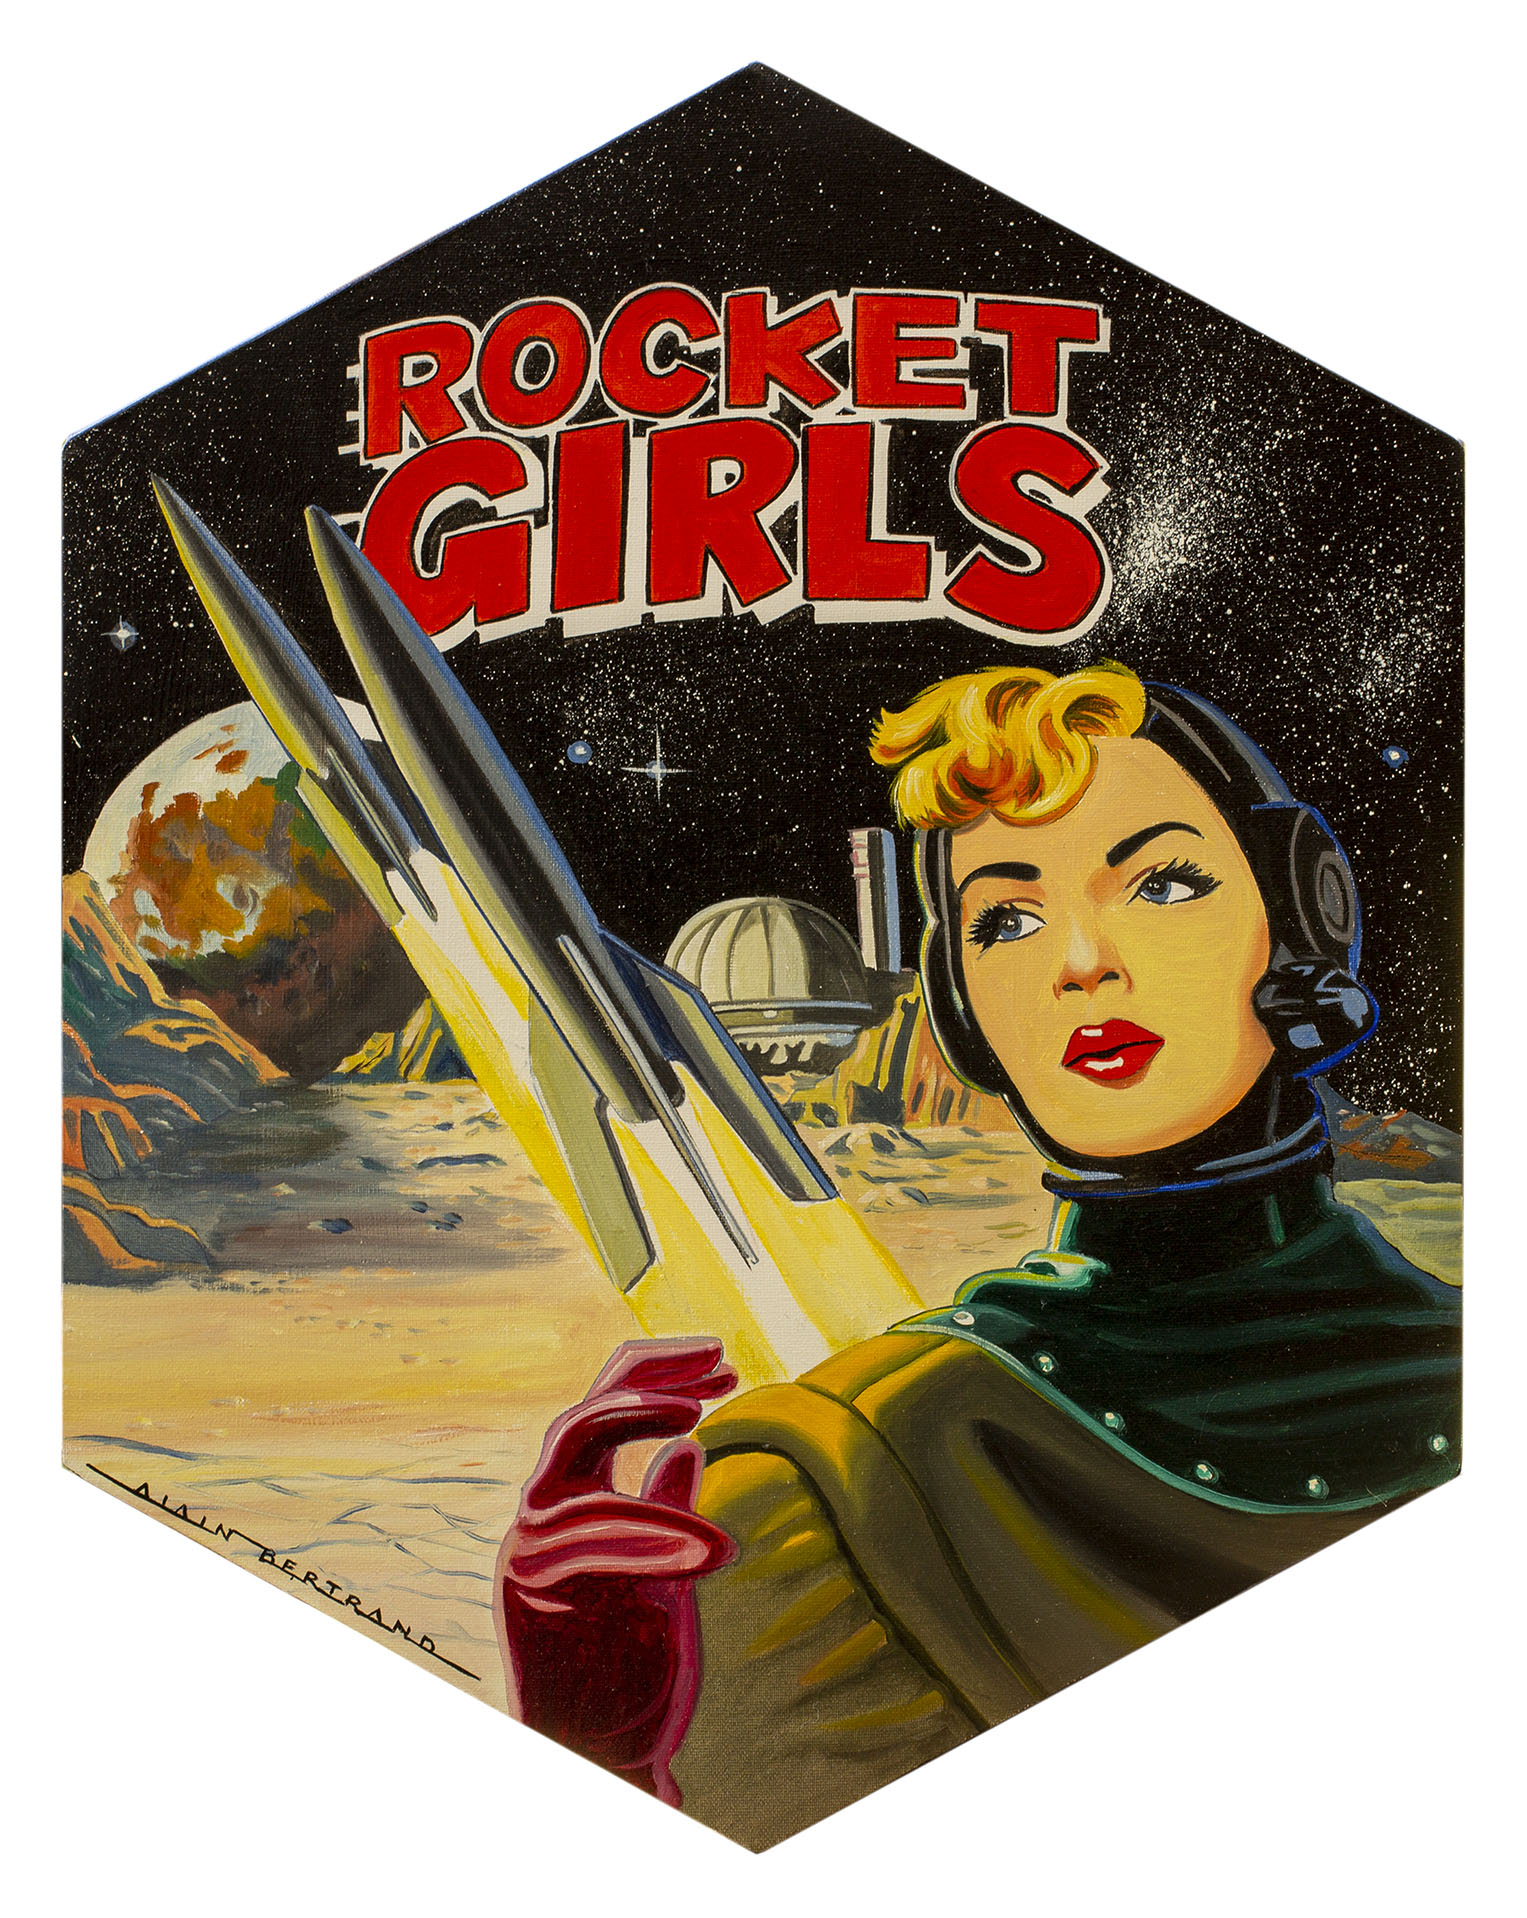 ROCKET GIRLS 60X45